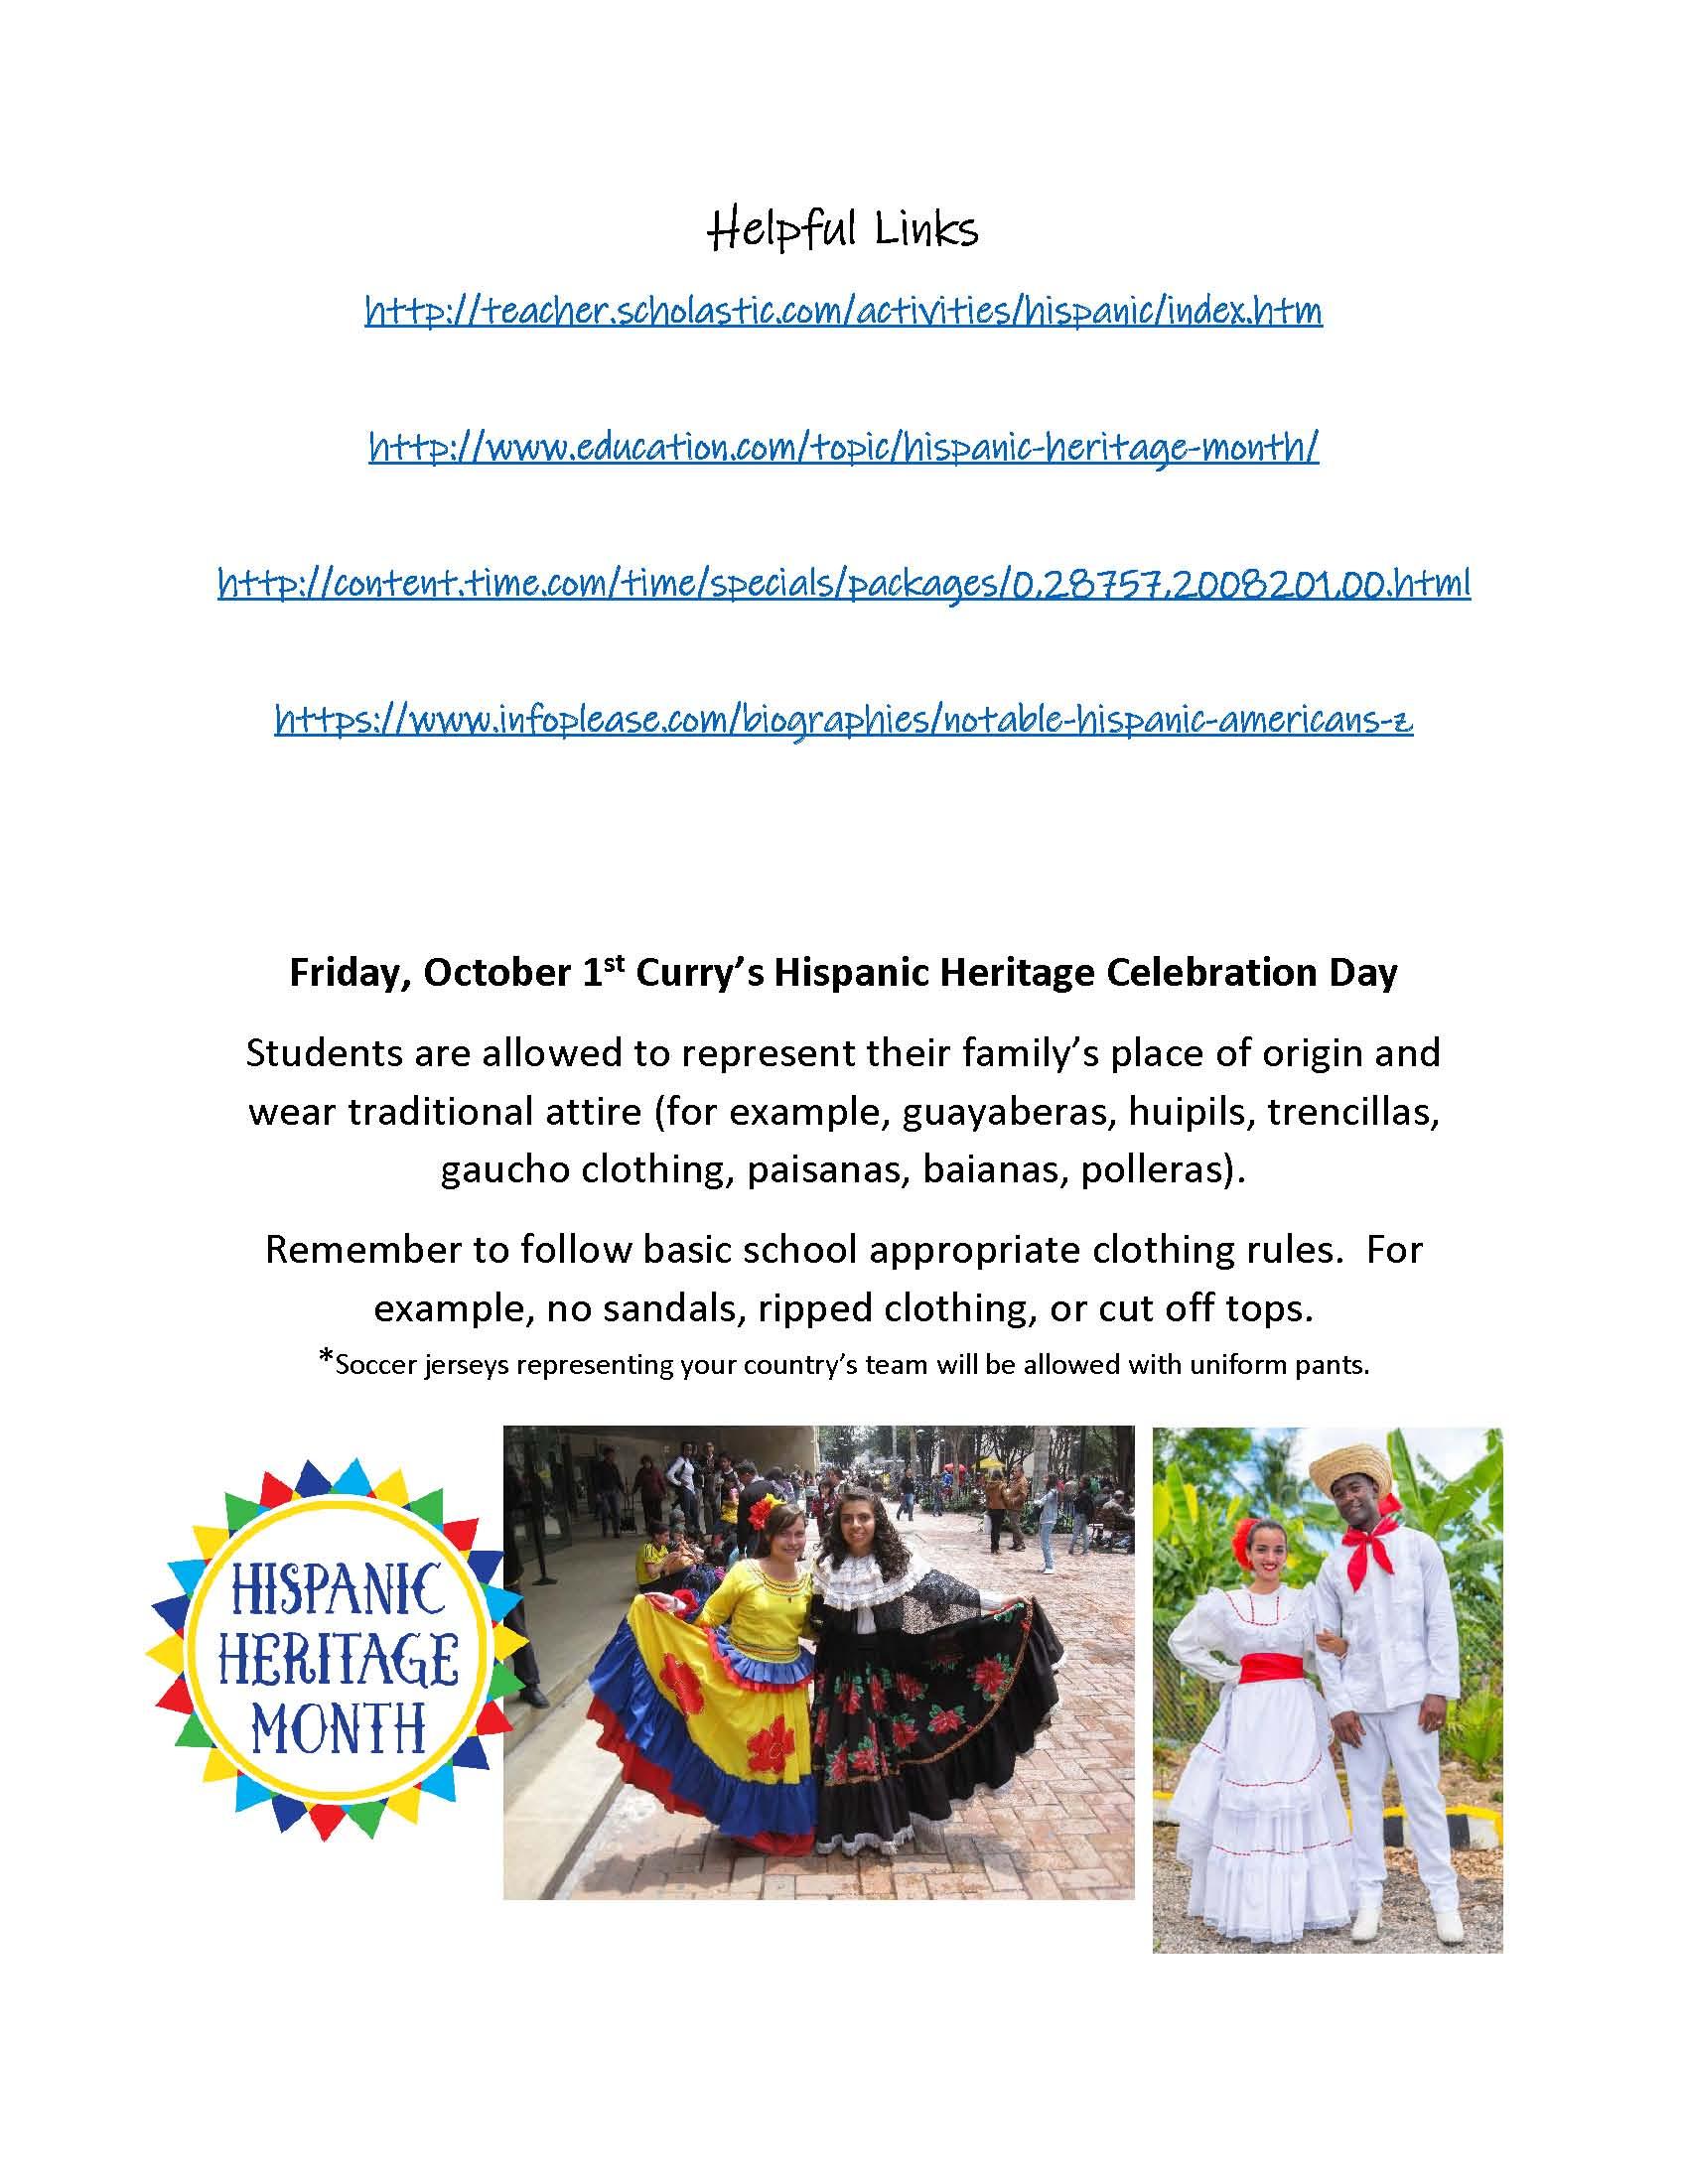 IB Homeroom Project 1 Hispanic Heritage Trading Card_Page_2